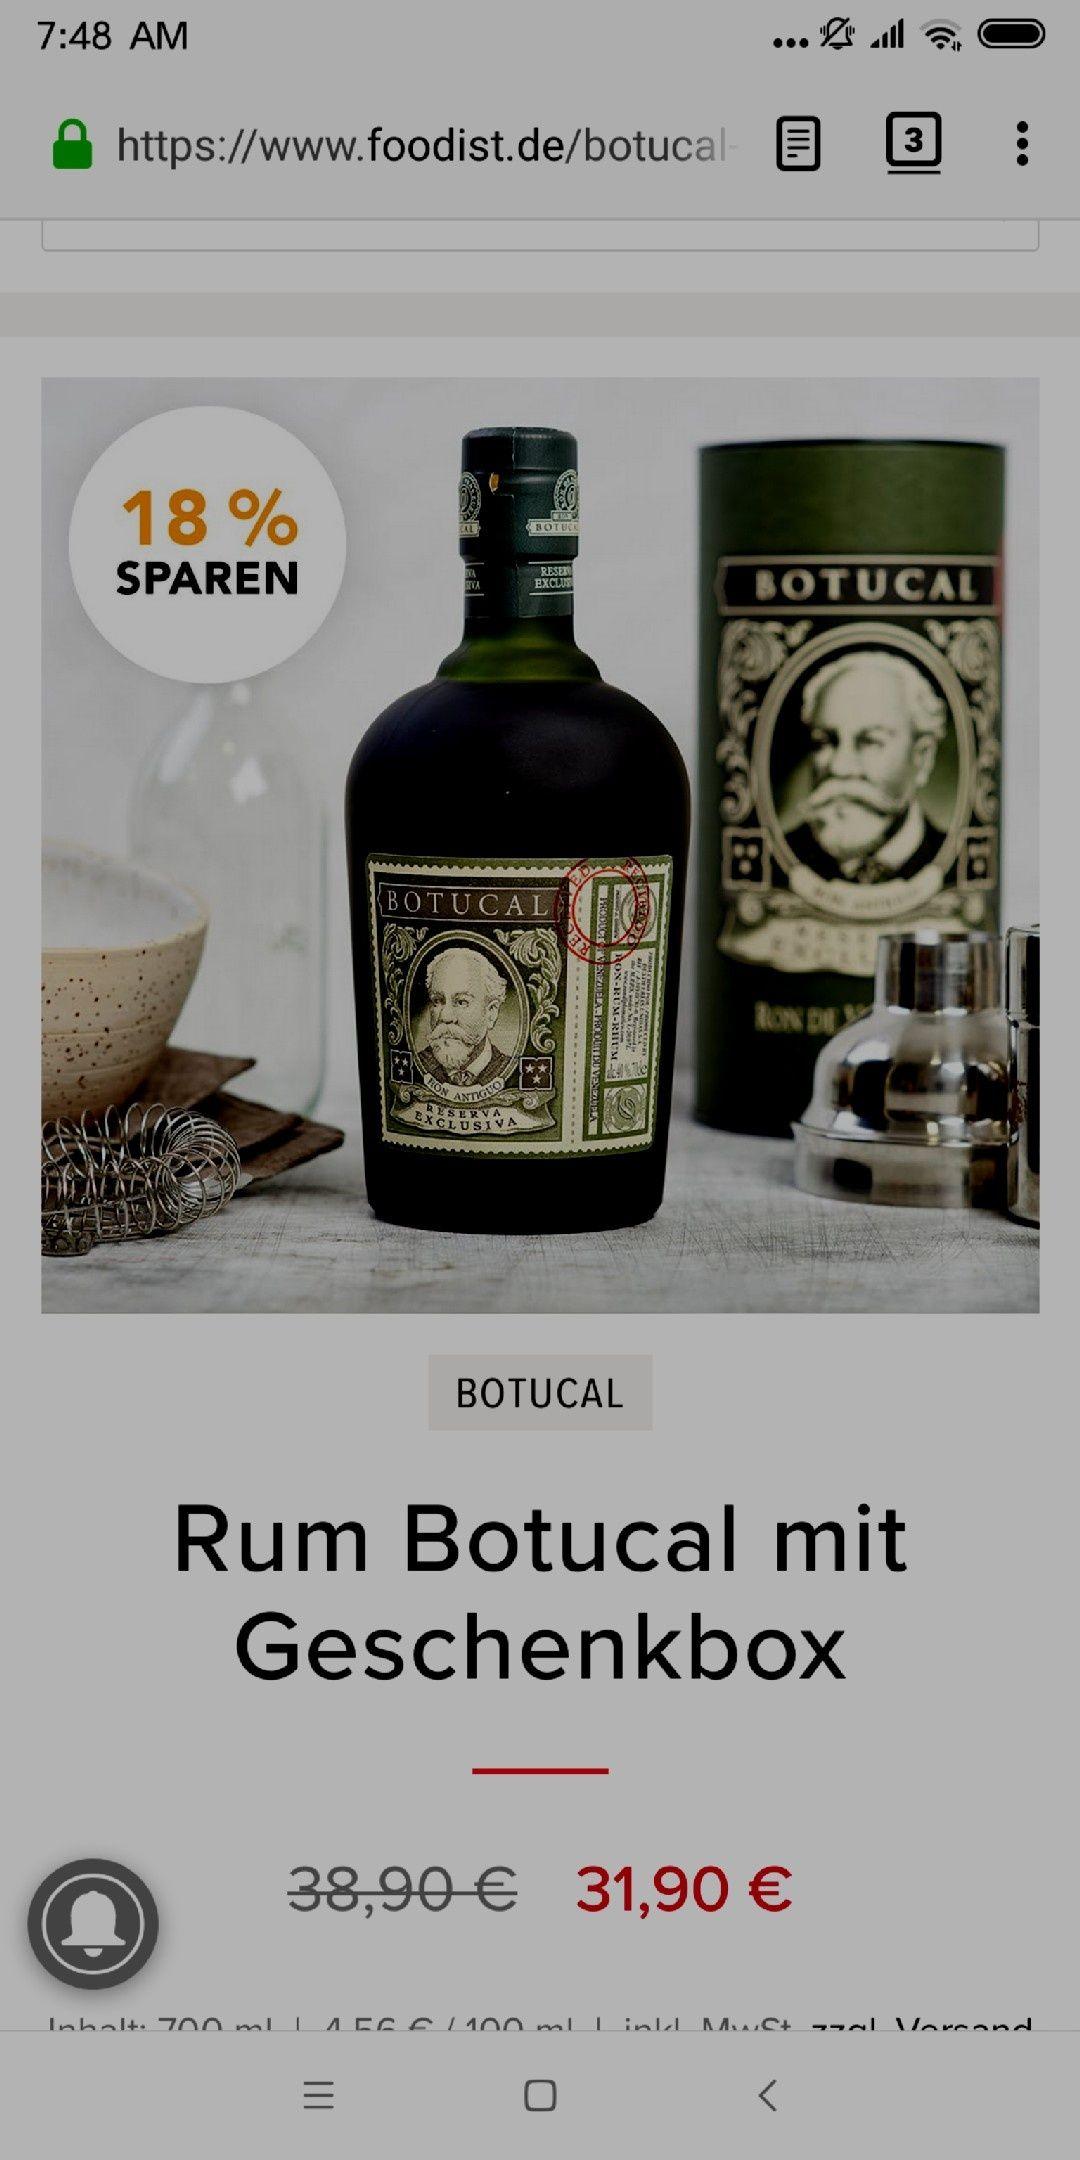 Rum Botucal mit Geschenkbox